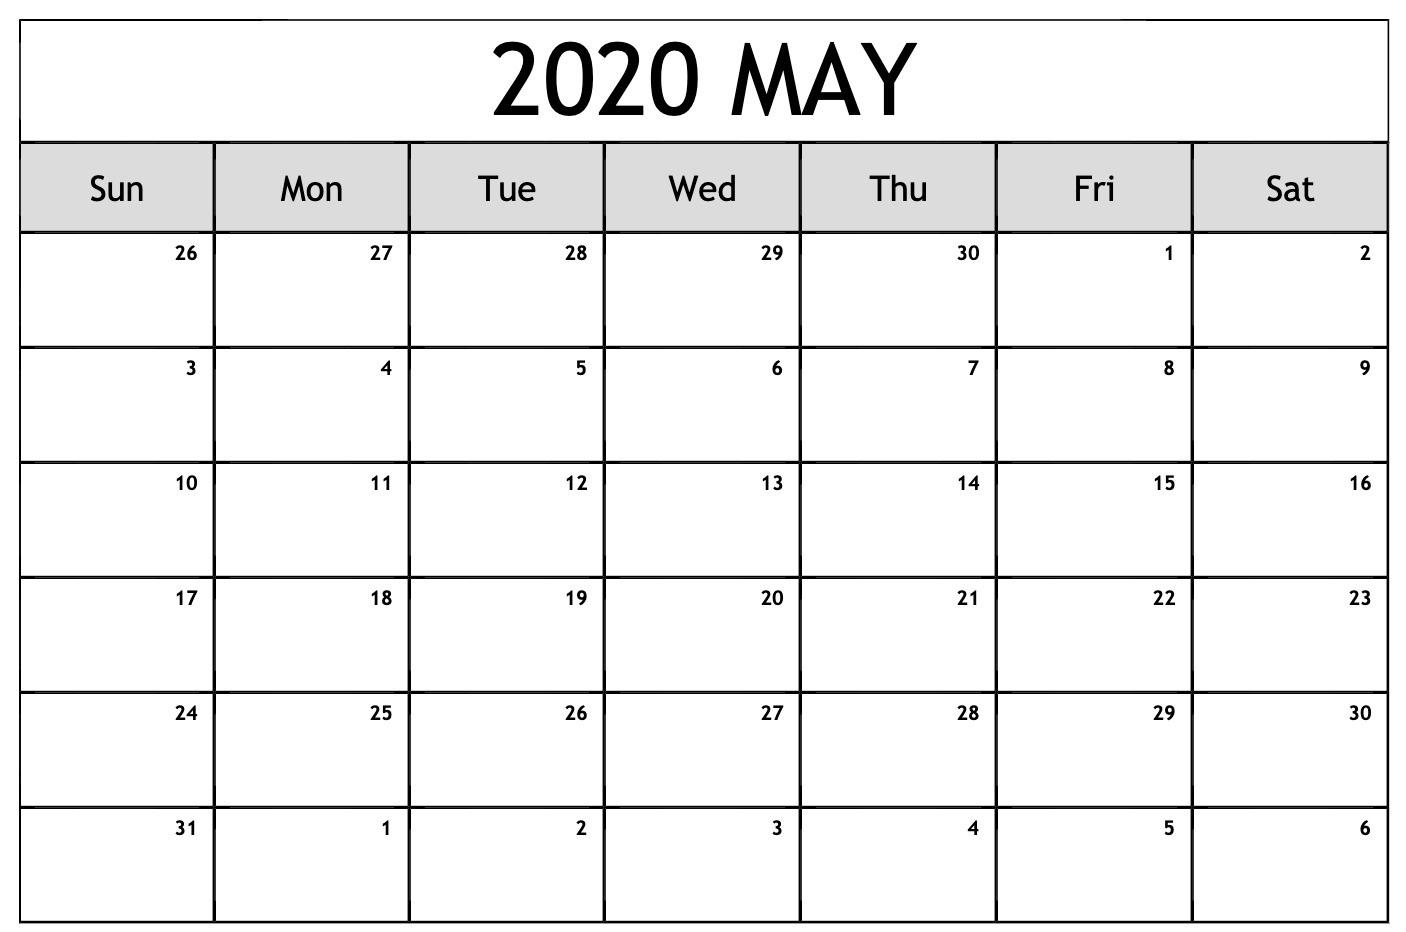 Free Calendar For May 2020 | Free Printable Calendar regarding Printable Fill In 2020 Calendar Large Print